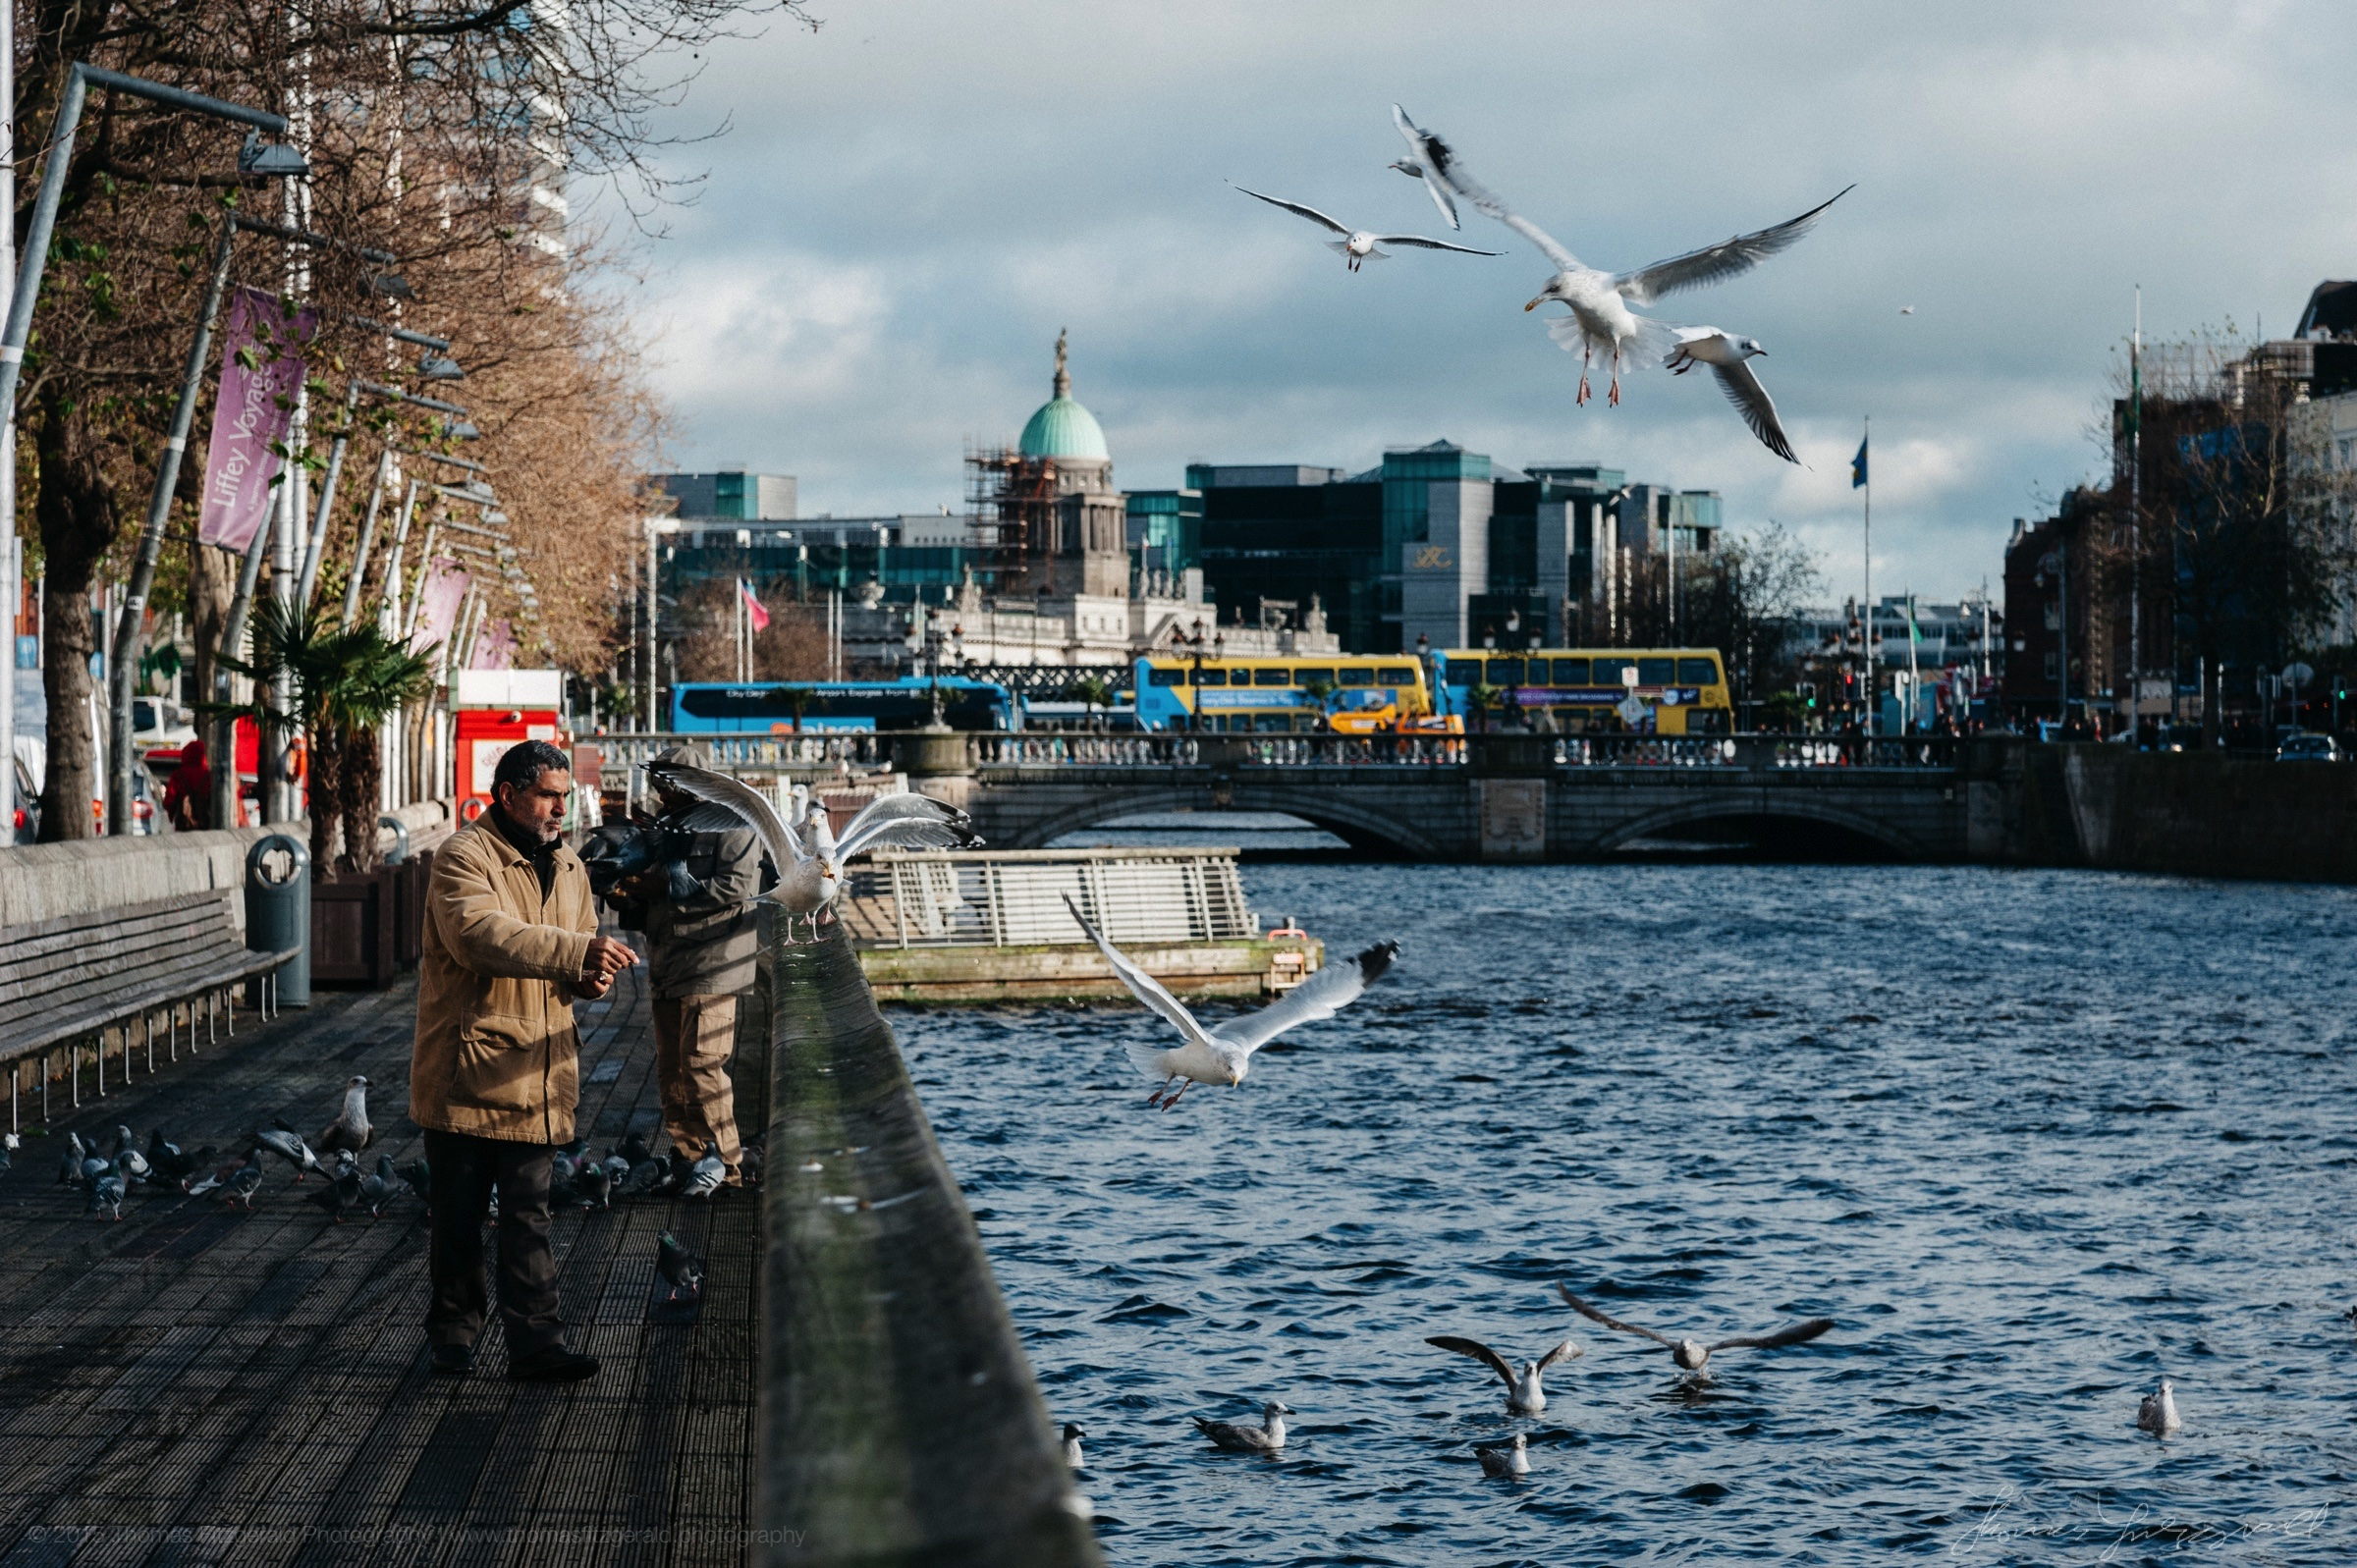 Feeding the birds on the boardwalk in Dublin City